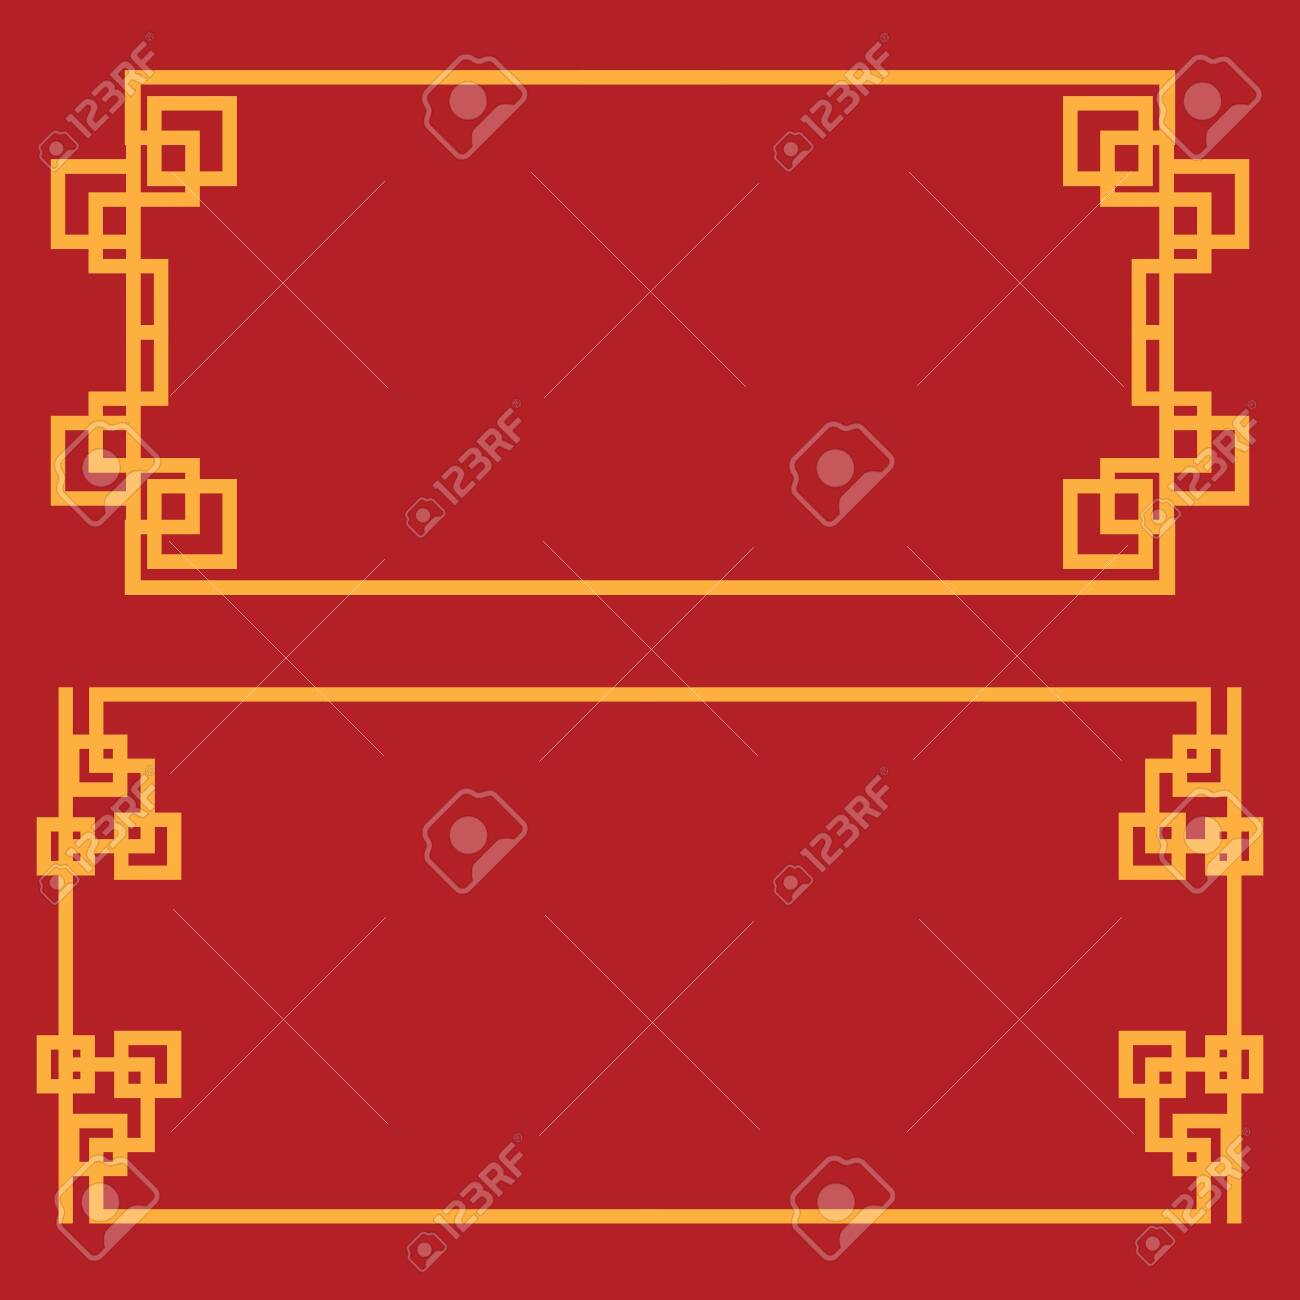 Chinese border Vector illustration design template - 149495648